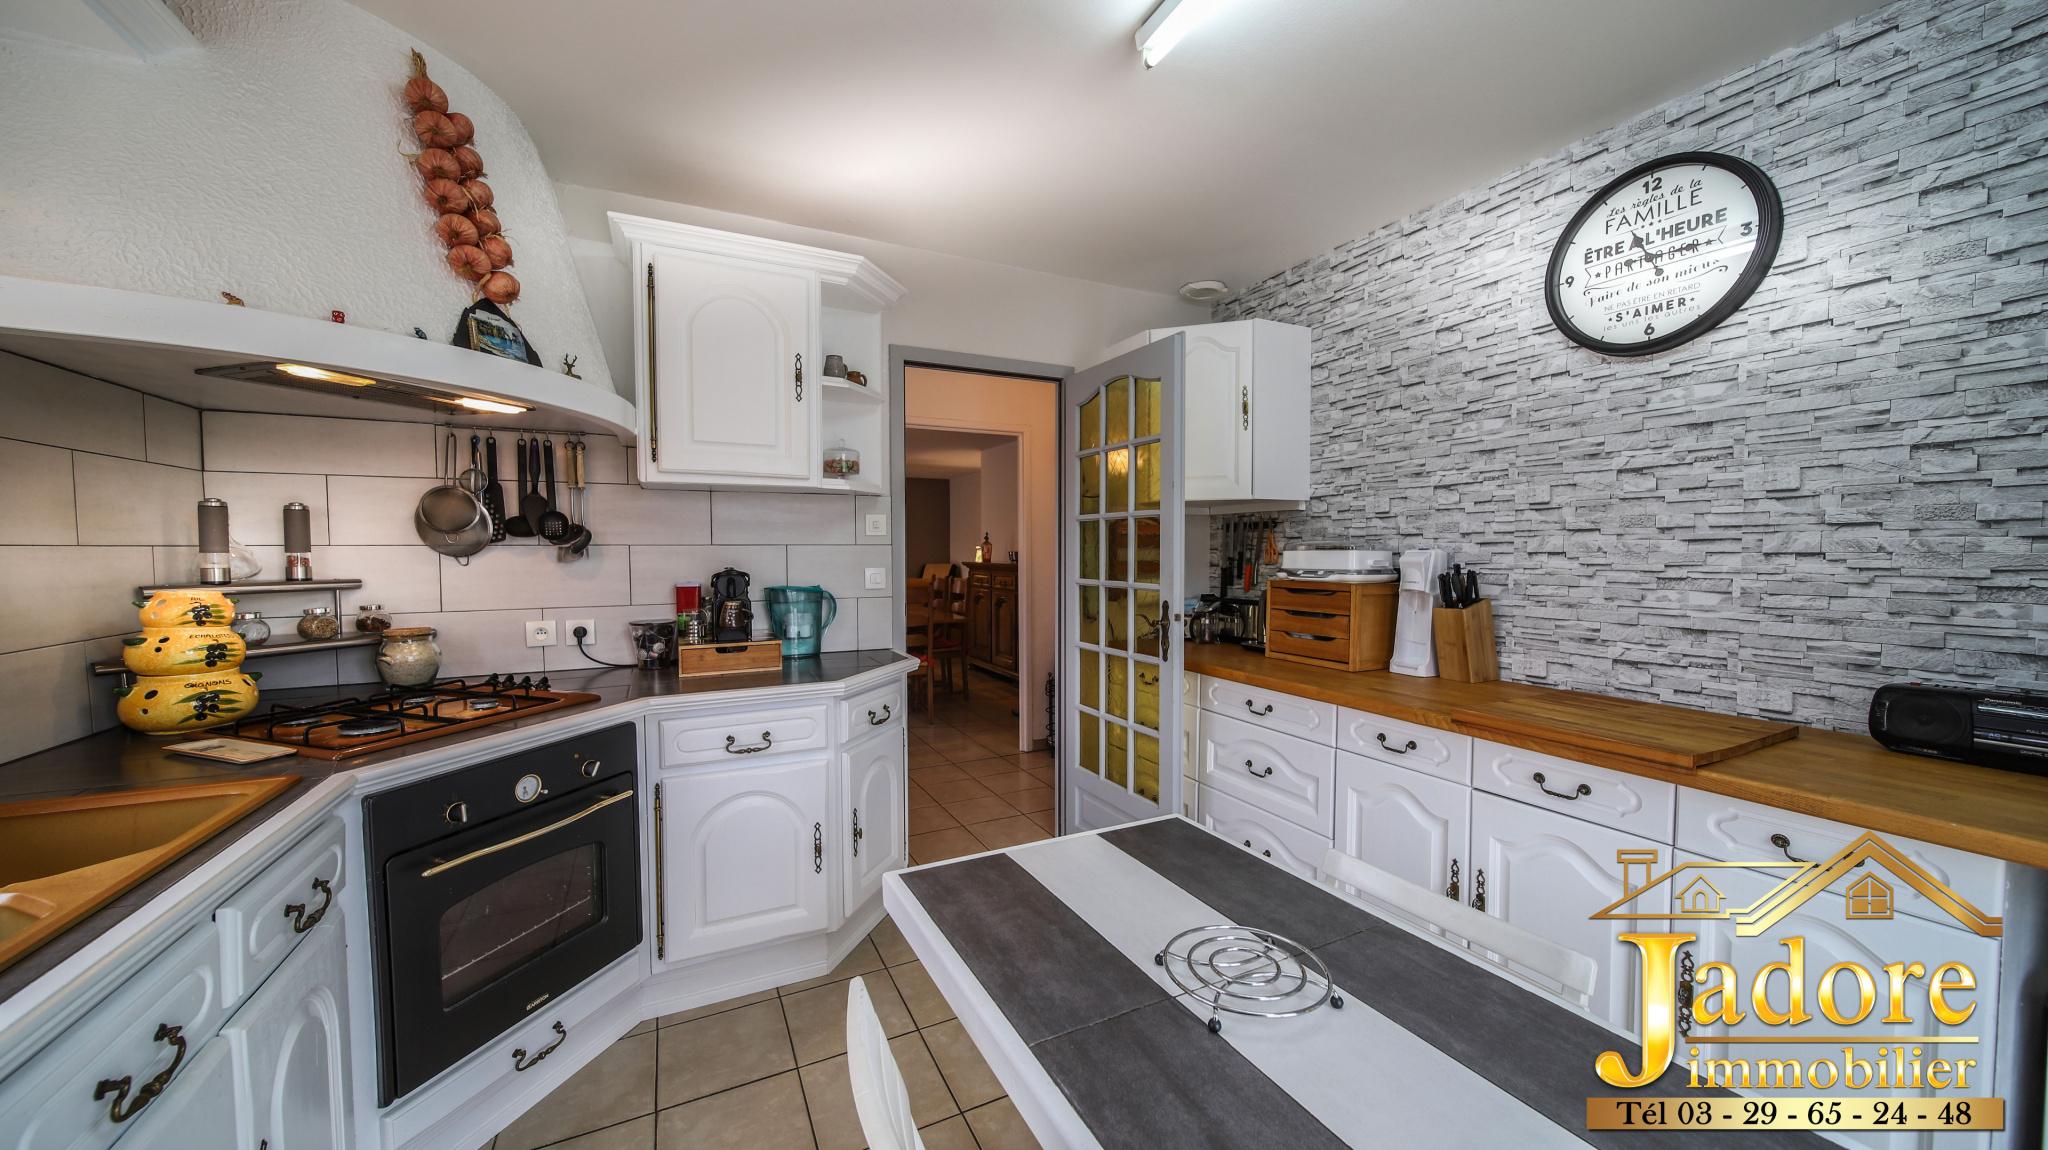 maison/villa à vendre rambervillers